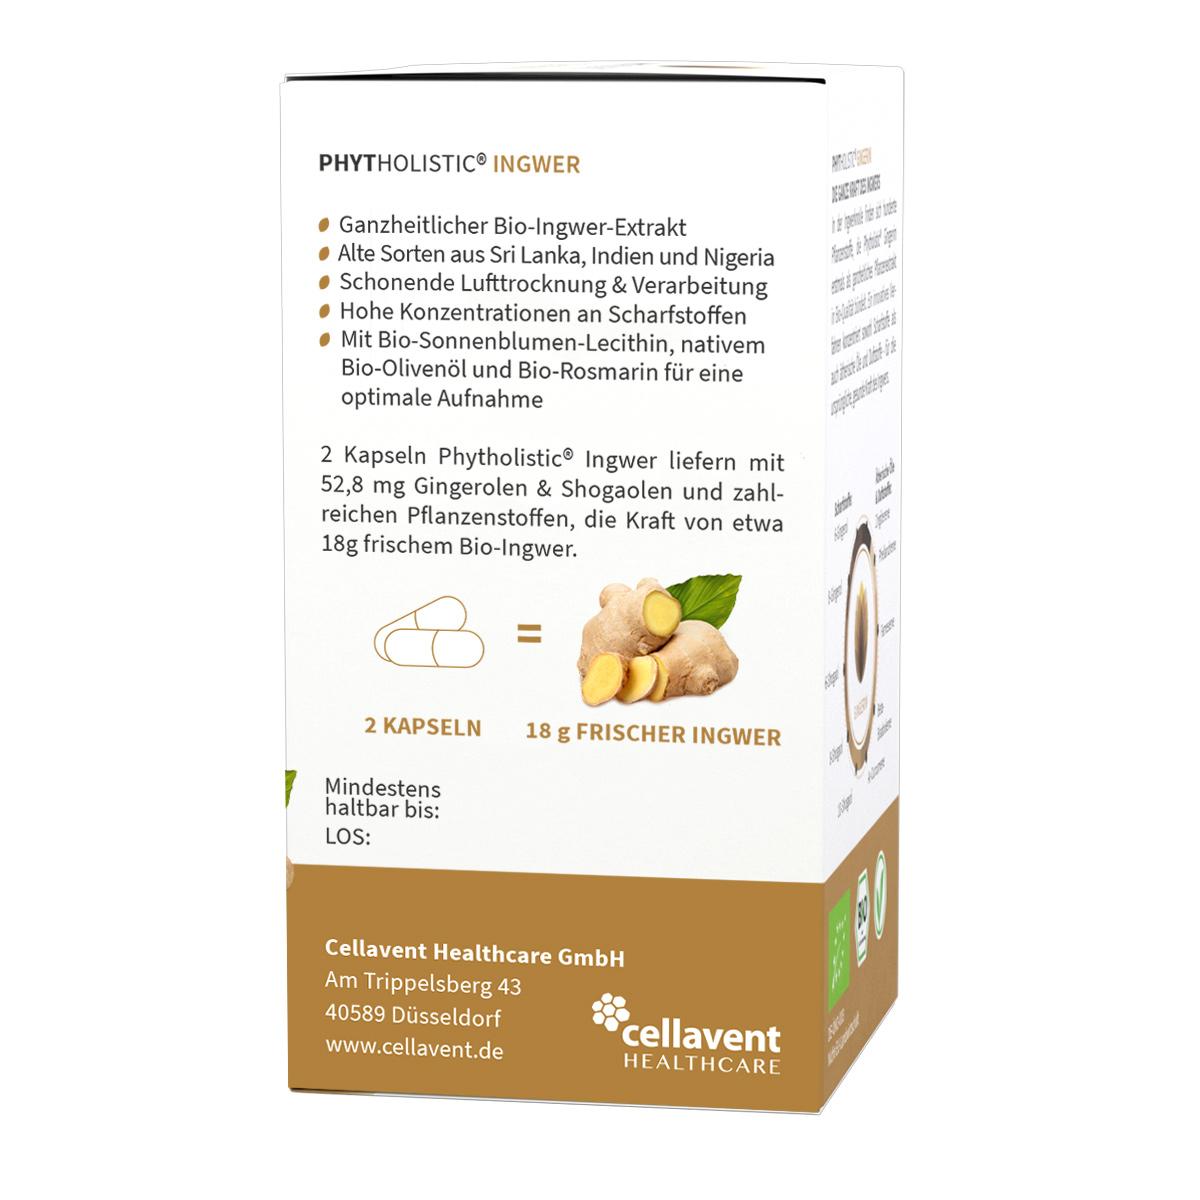 ingwer-kapseln-bio-rein-pflanzlich-gingerin-phytholistic-60-stueck-verpackung-rechts-1200x1200